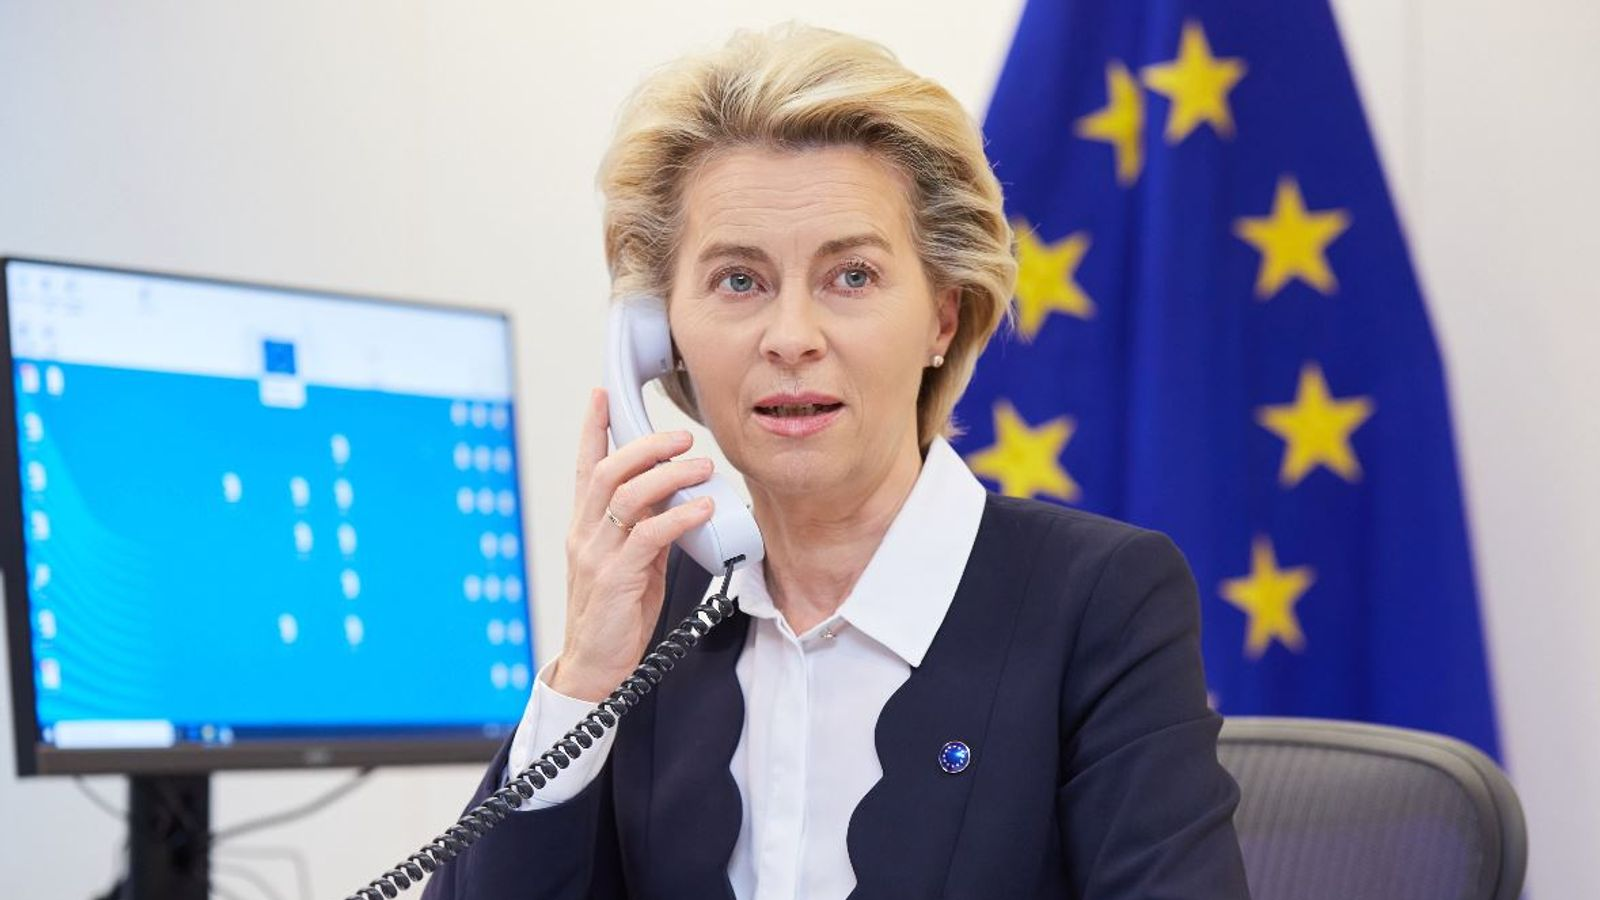 'Significant gaps' remain between UK and EU on Brexit deal, Ursula von der Leyen warns